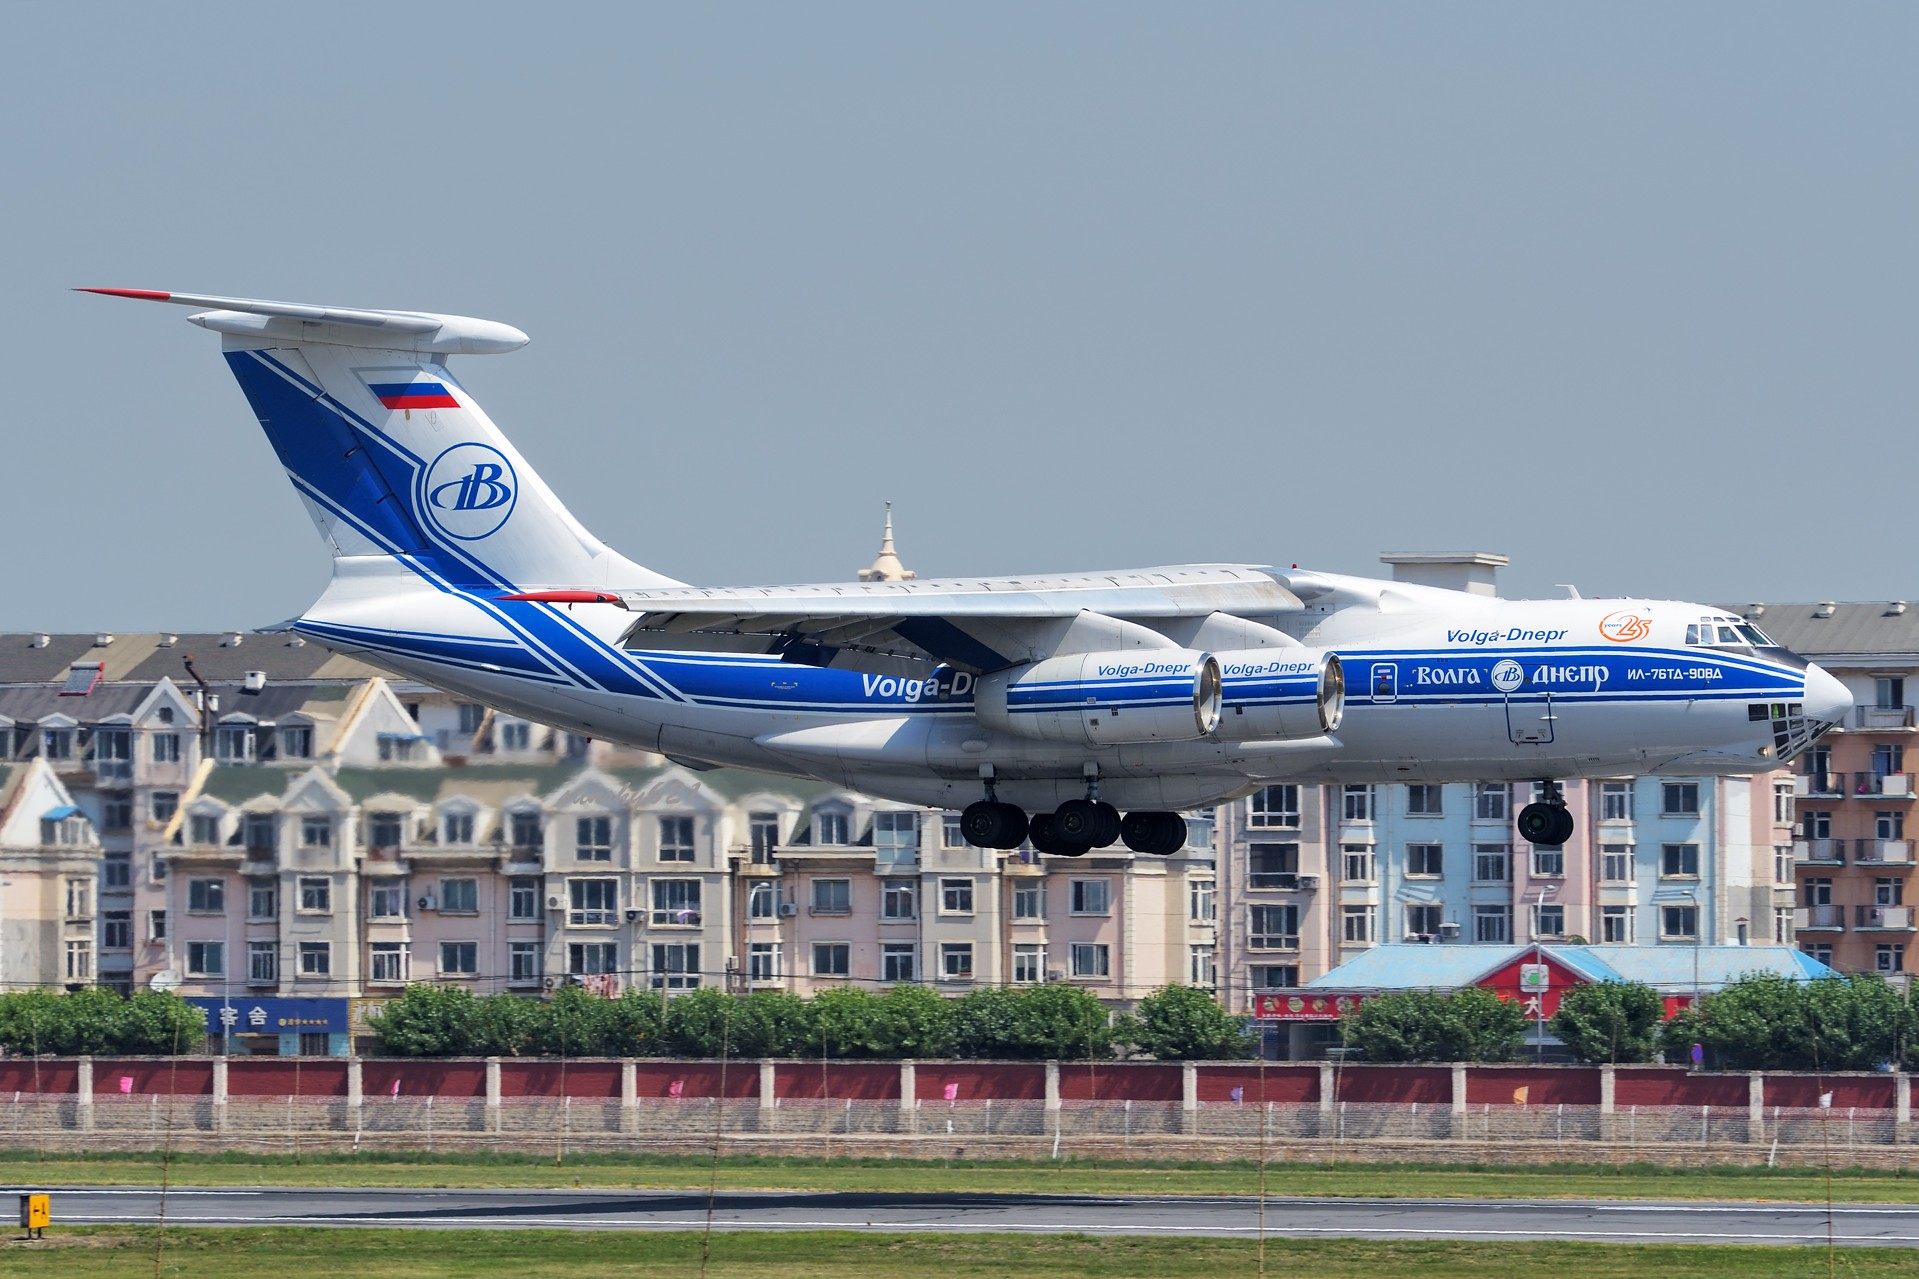 Re:[原创]★[DLC]一点有趣的事情(持续更新中)★ ILYUSHIN IL-76 RA-76511 中国大连国际机场